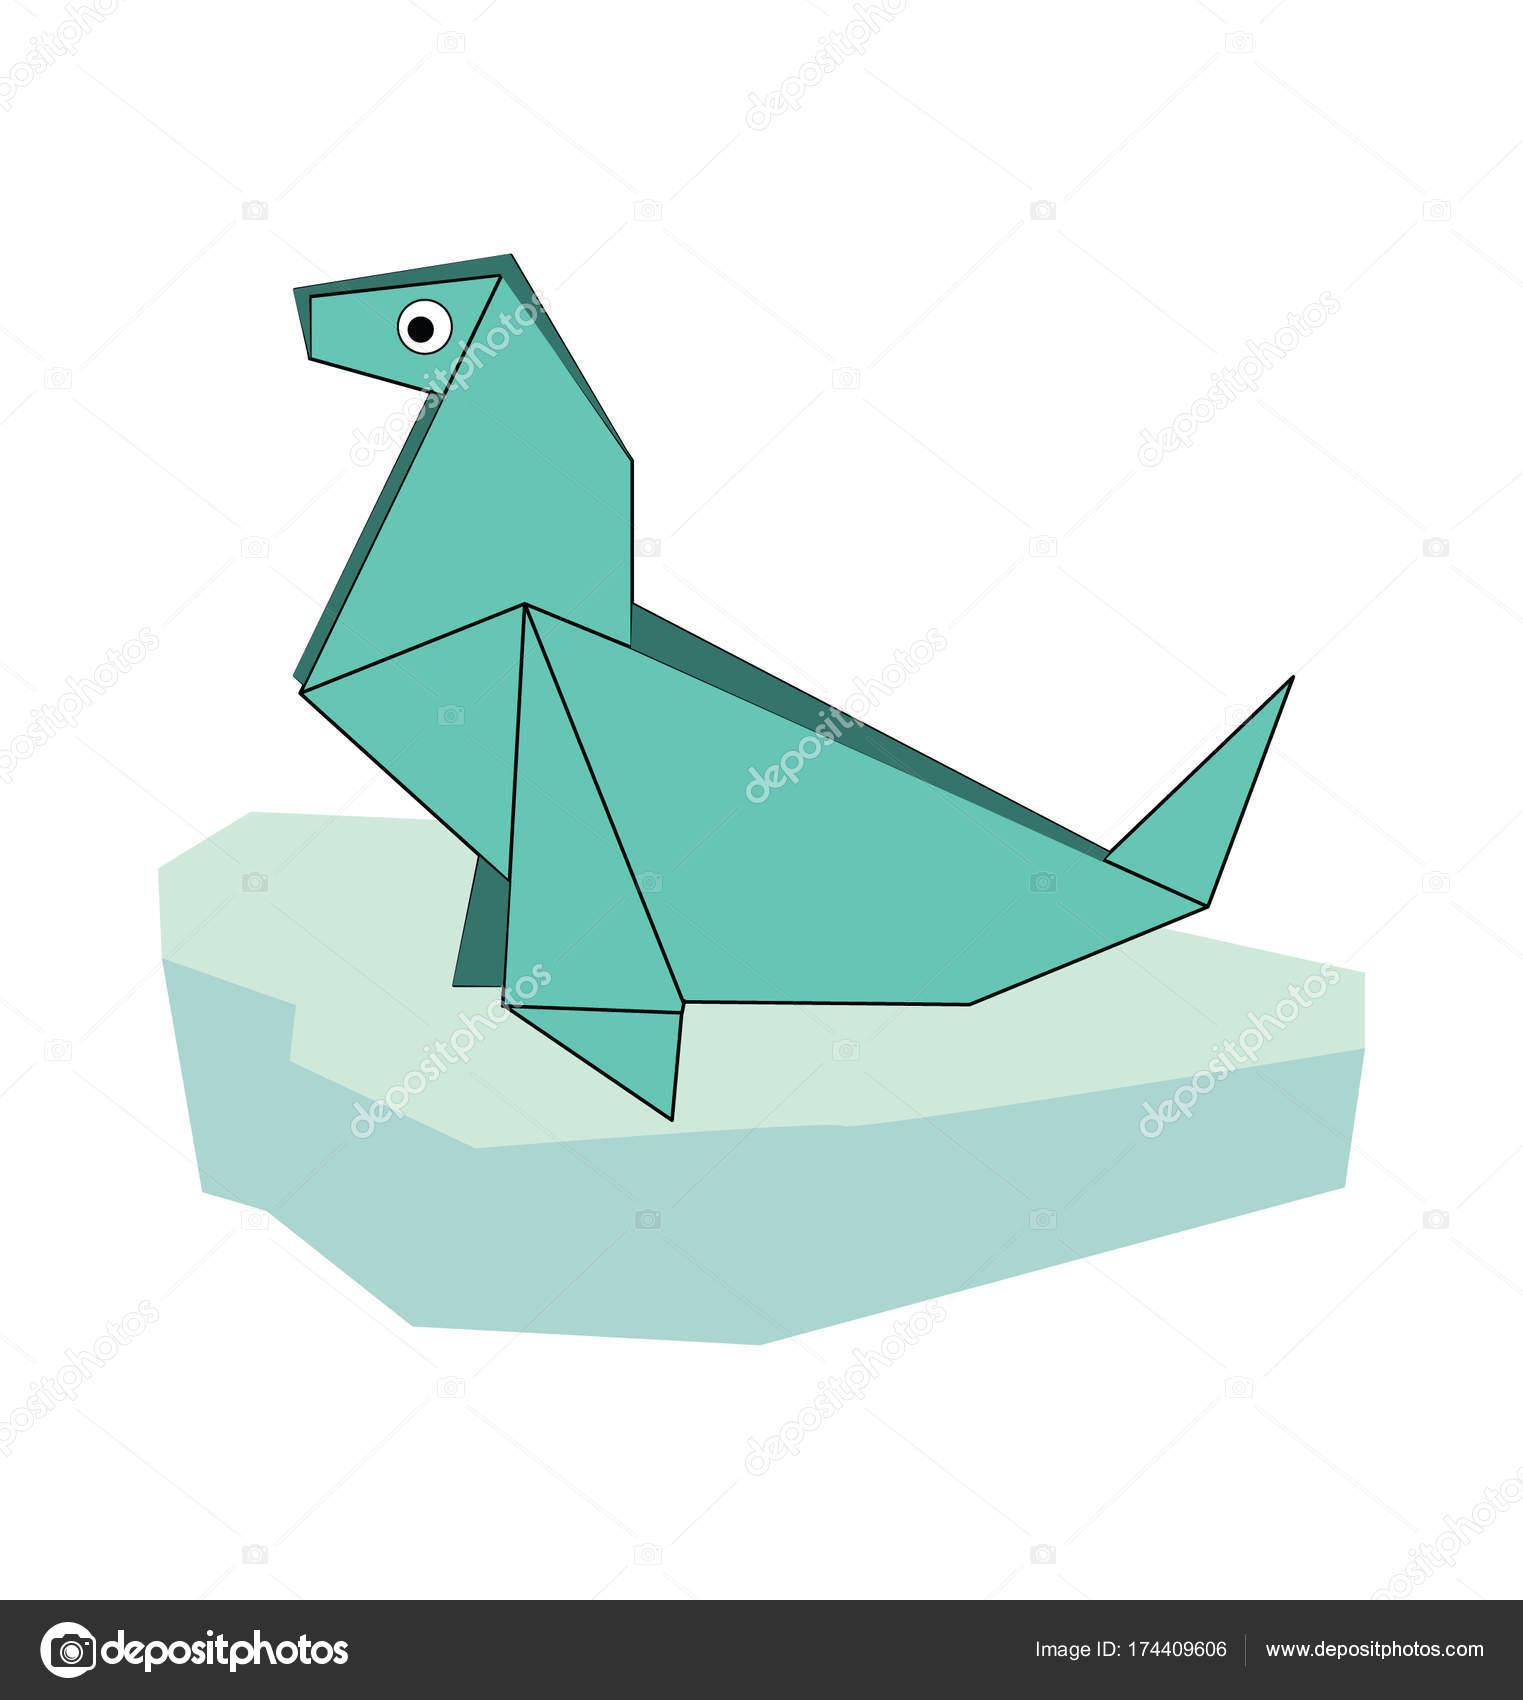 Illustration of folded paper models seal on iceberg on white illustration of folded paper models seal on iceberg on white background vector illustration jeuxipadfo Gallery